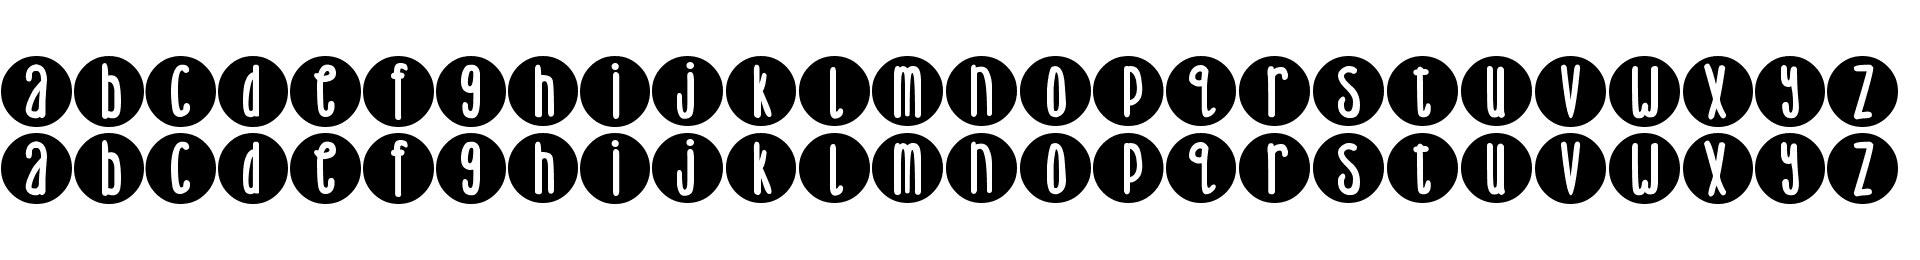 DJB Lemon Head Dots